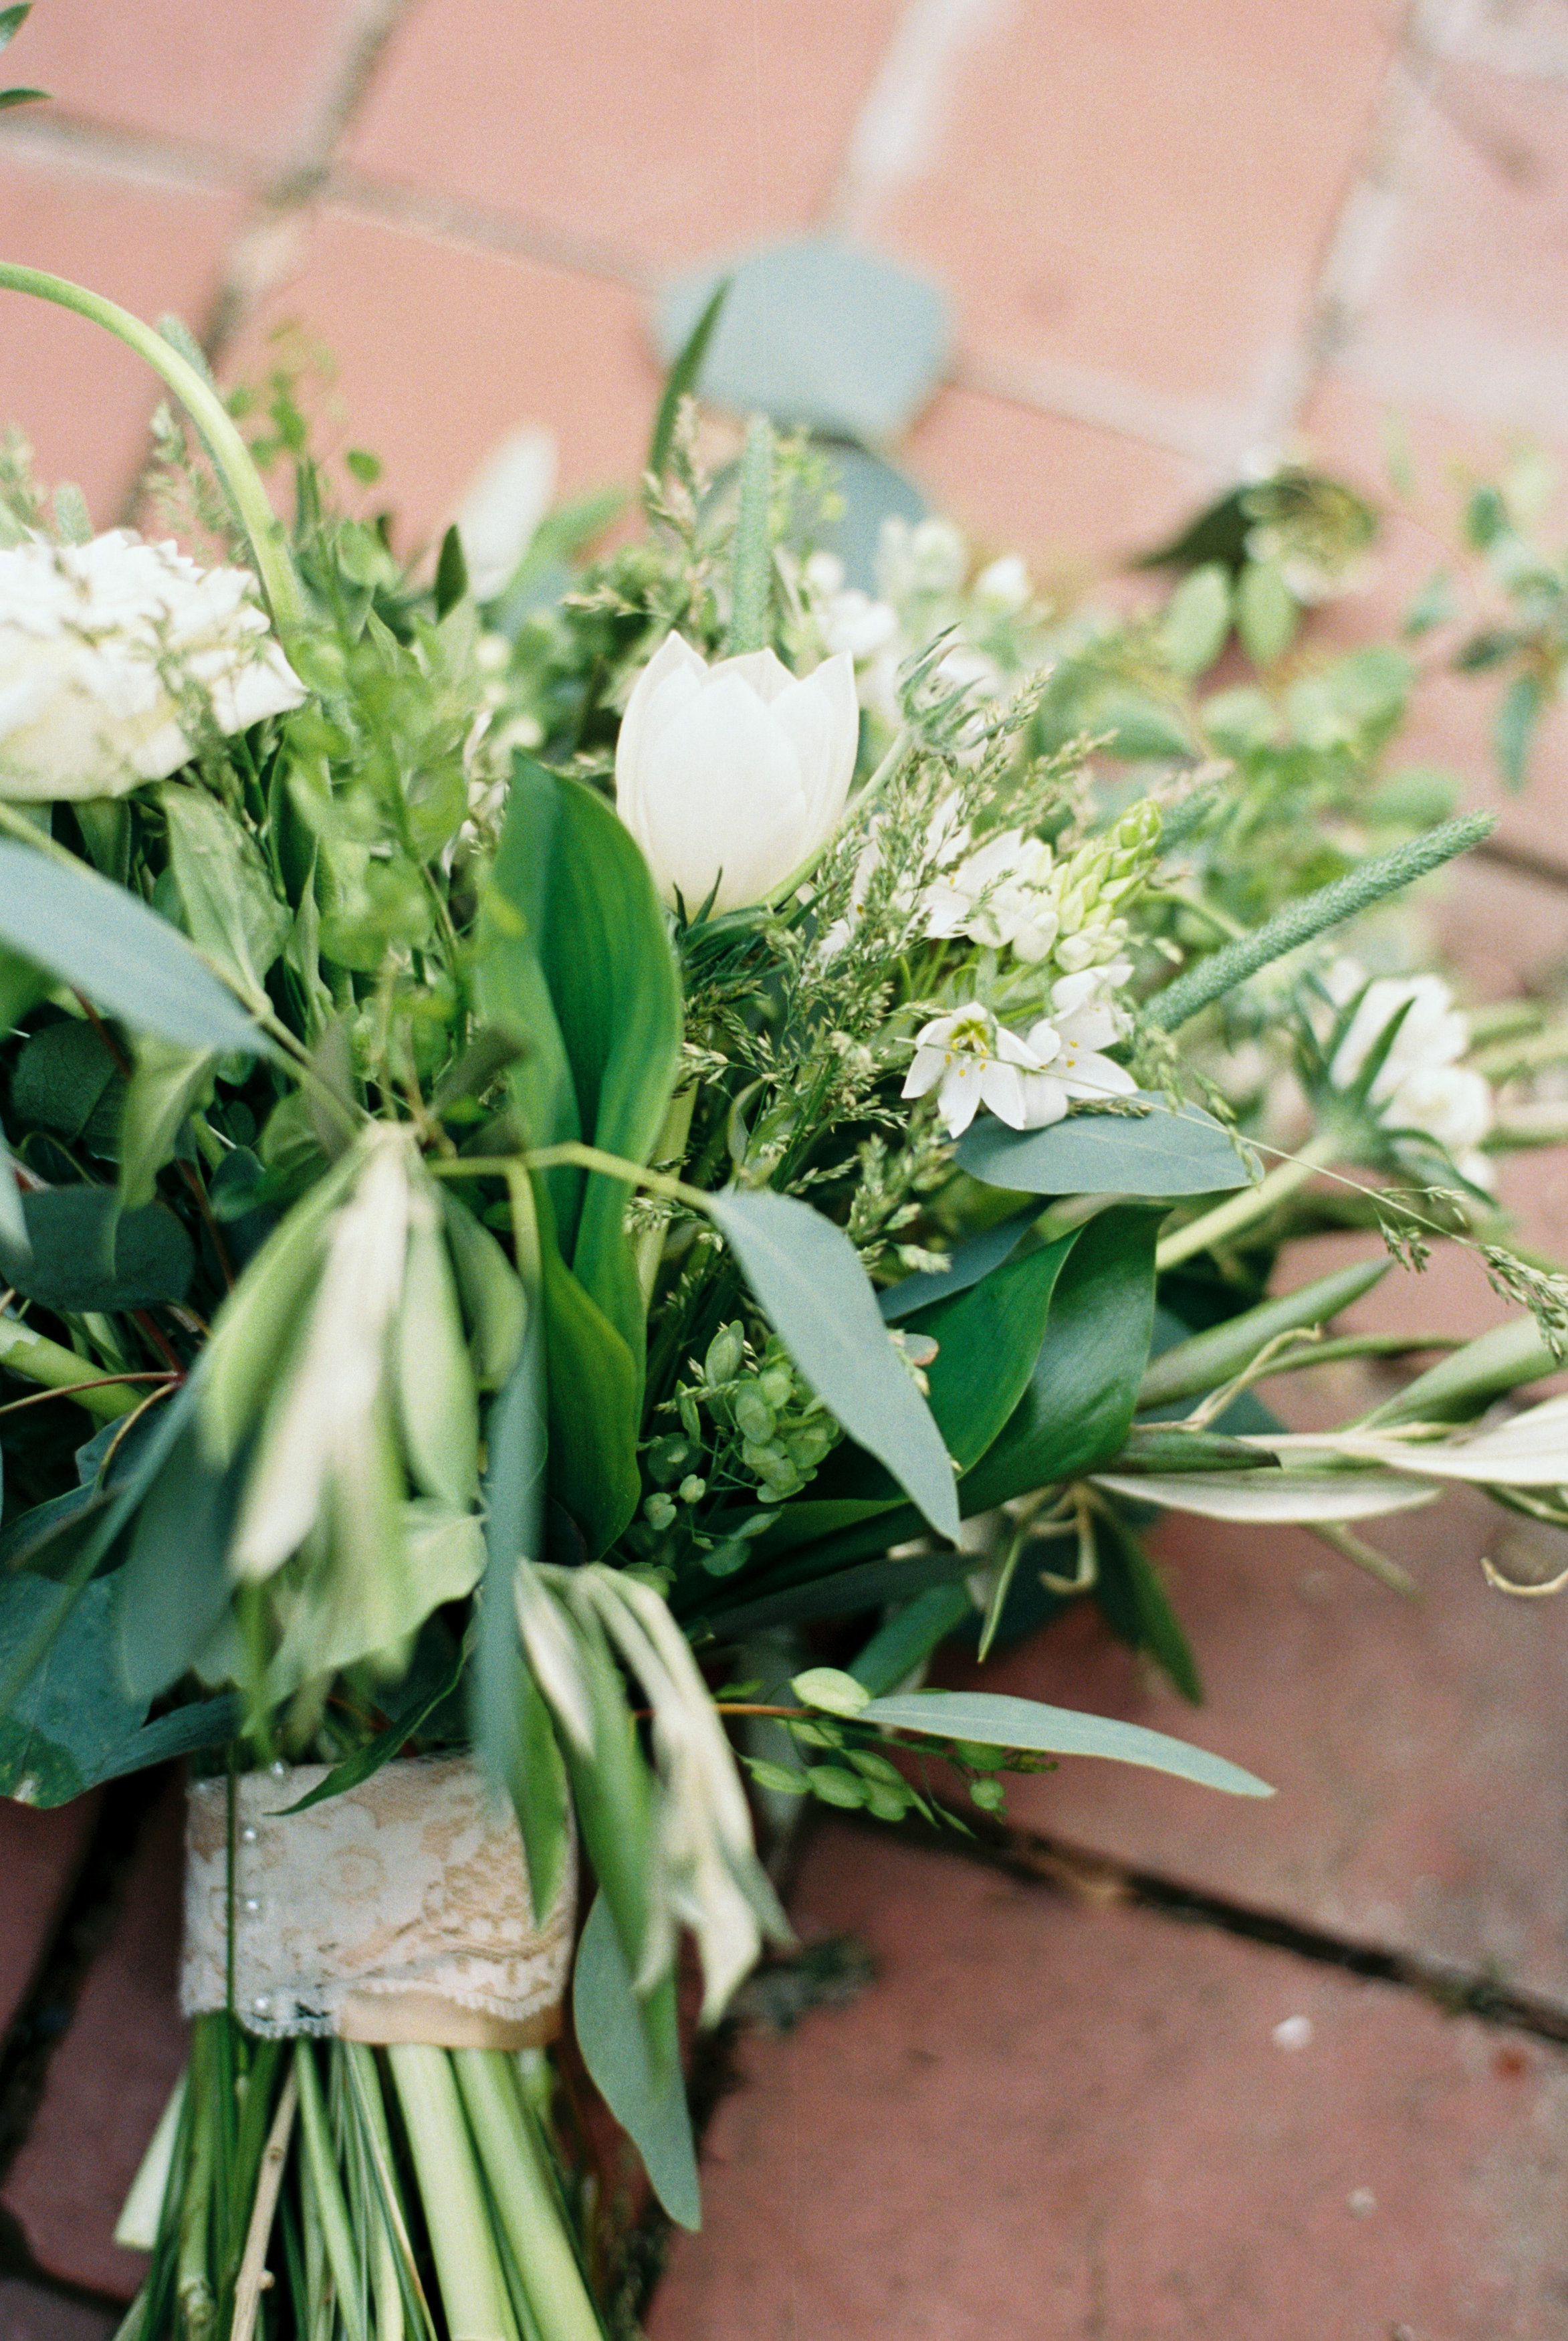 greenhouse-wedding-inspiration-by-laurelyn-savannah-photography-151.jpg